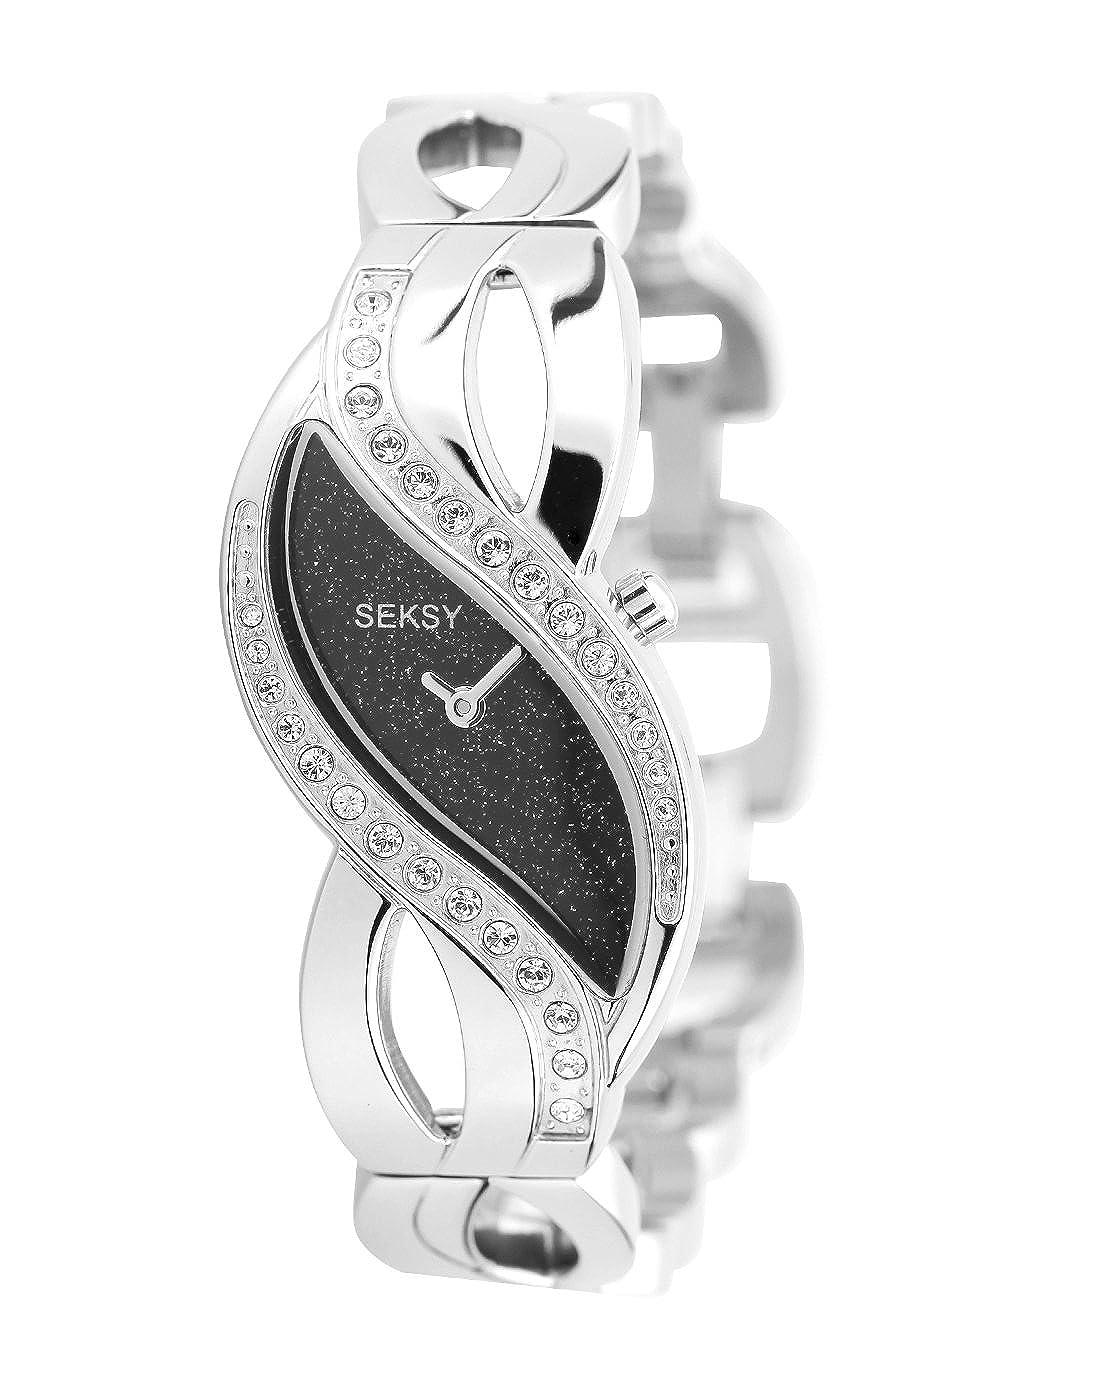 Quarz 4276 Sekonda Damen Seksy 37Uhren Armbanduhr By Analog PXuiOkZT